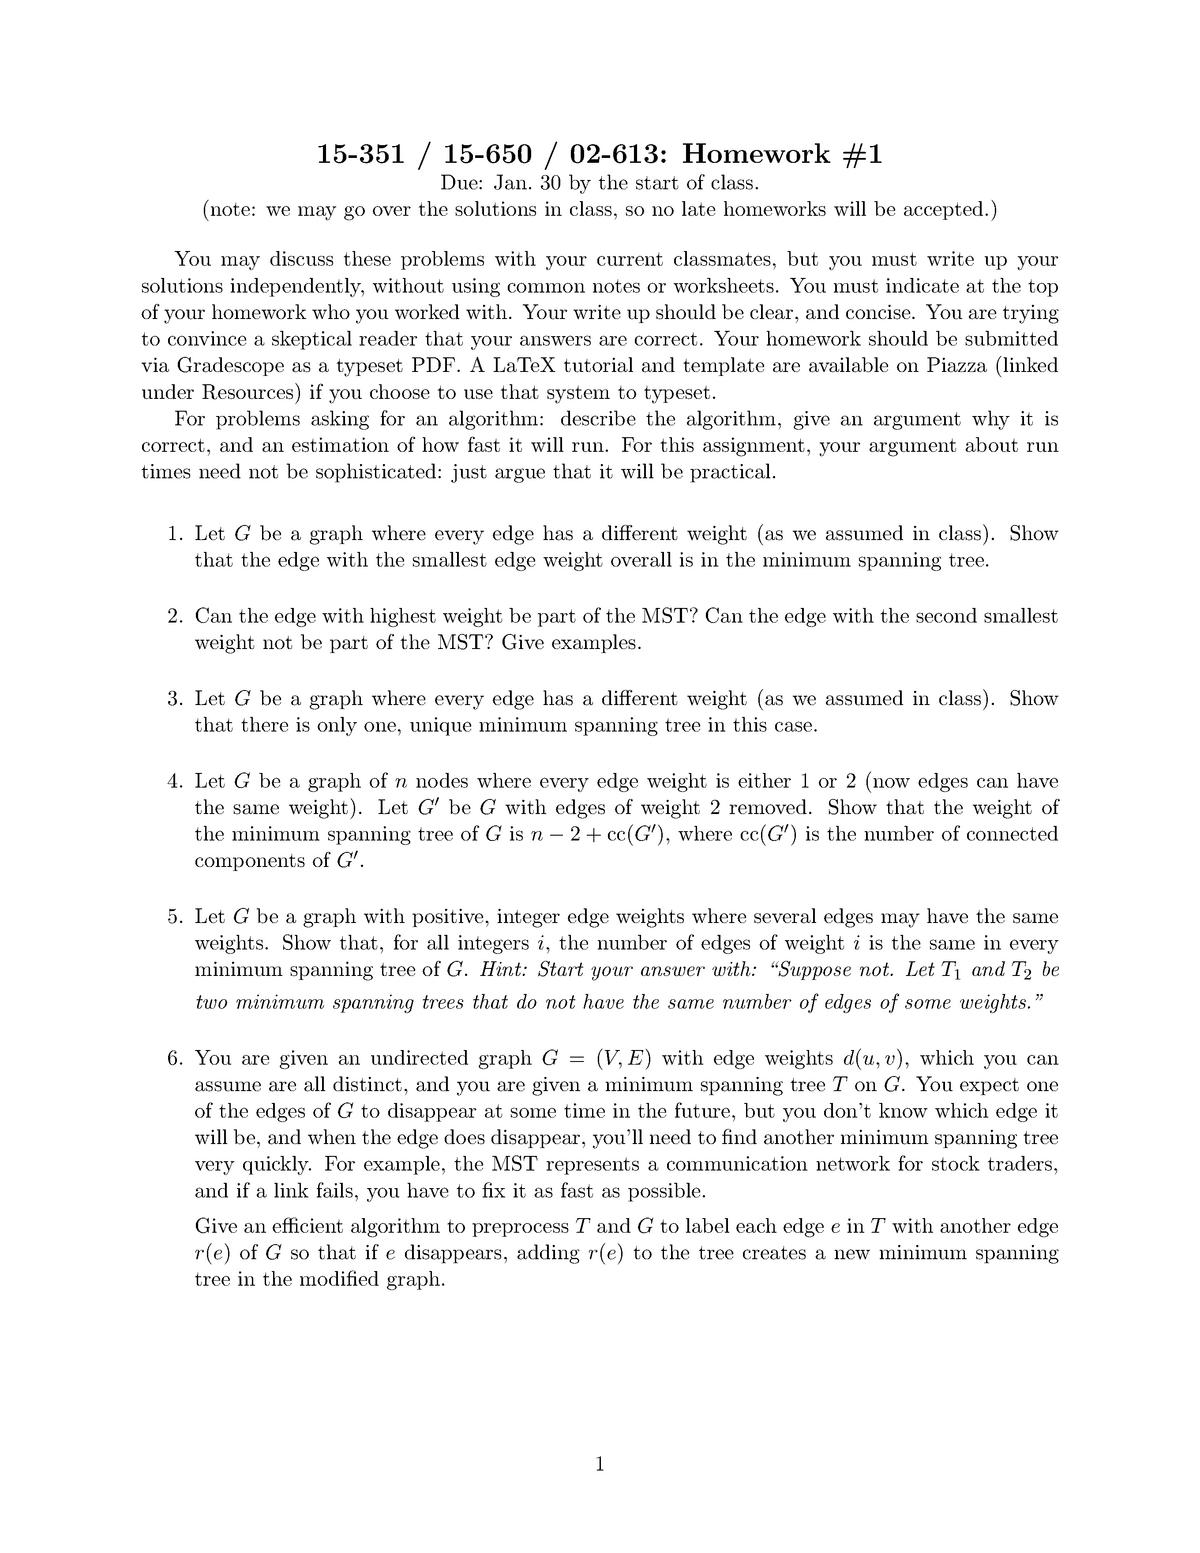 Hw1 - Homework 1-Questions - 15-650: Algorithms and Data